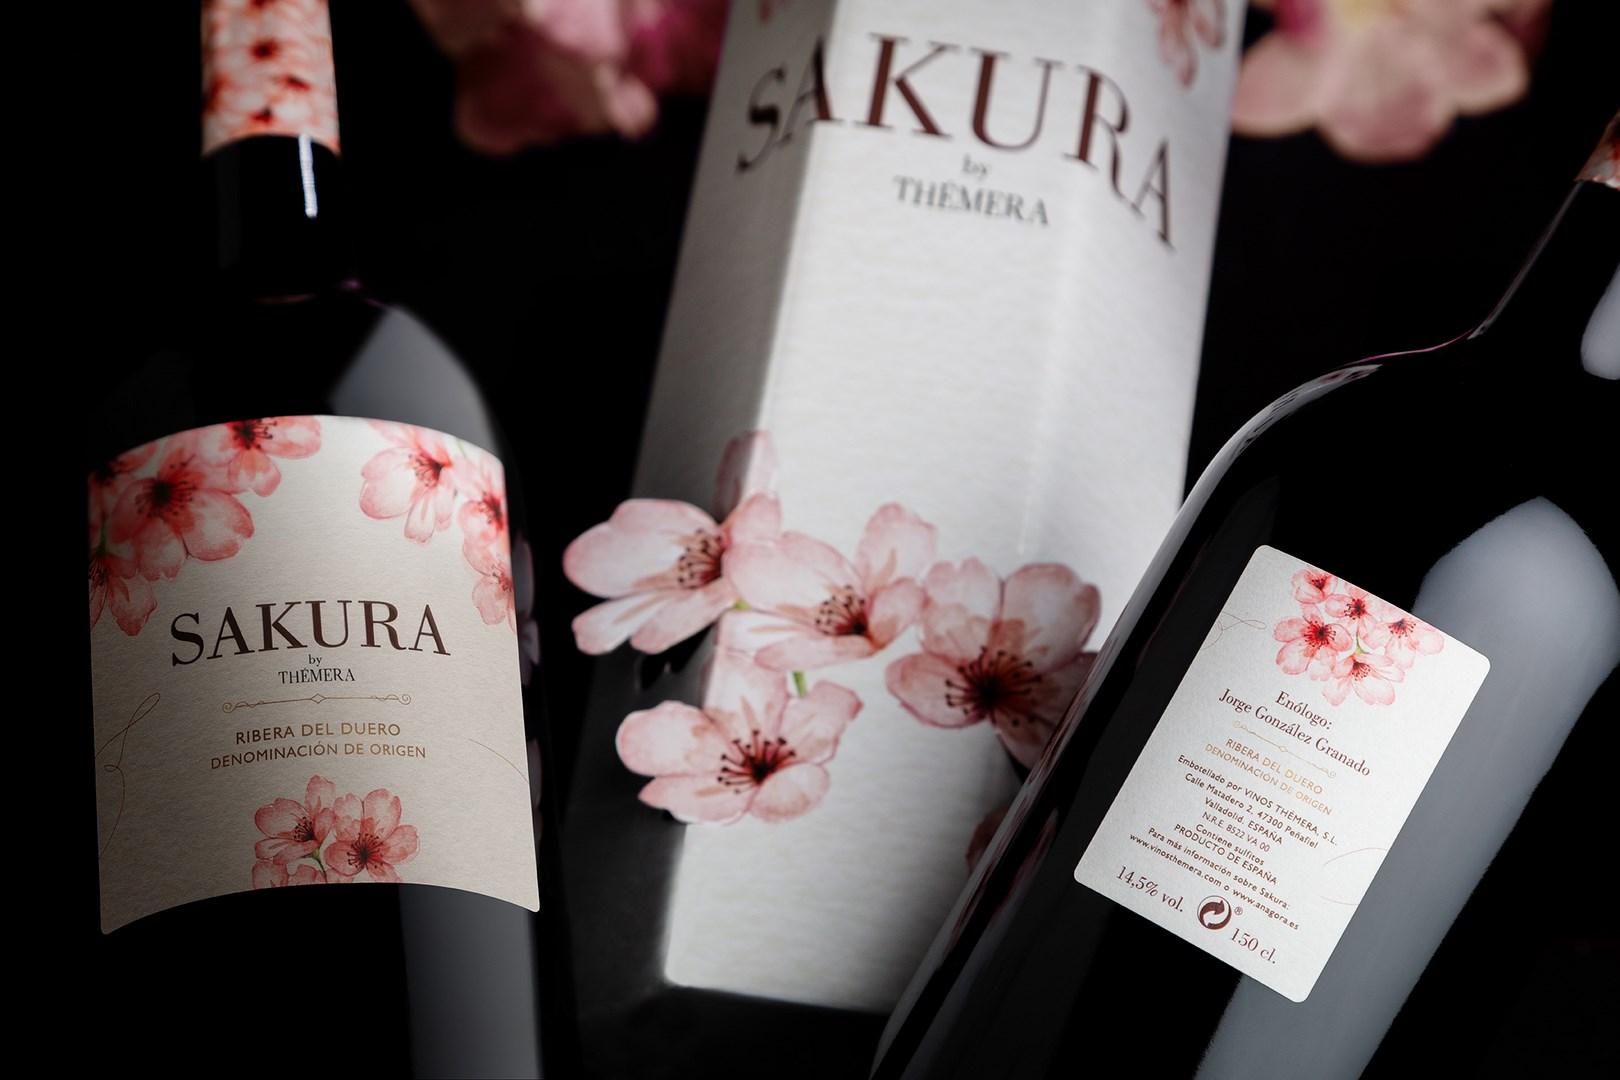 02-Sakura-bodegon